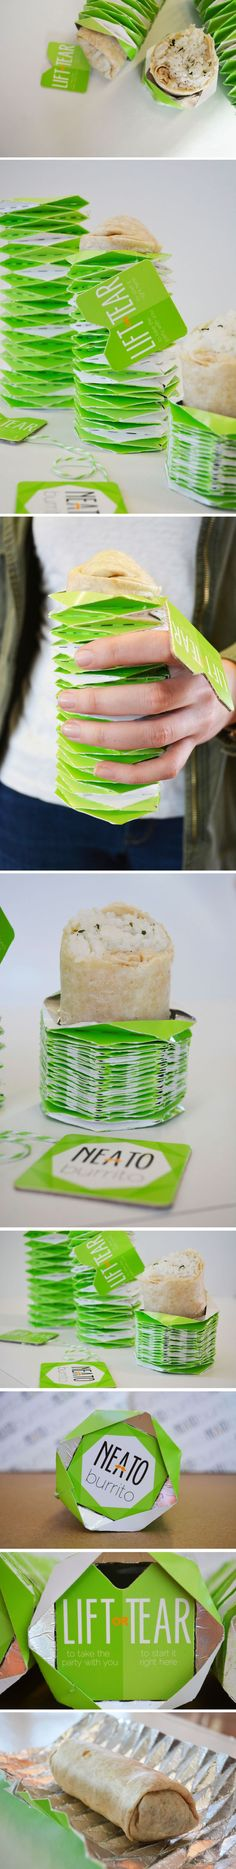 Neeto Burrito Student Packaging Concept